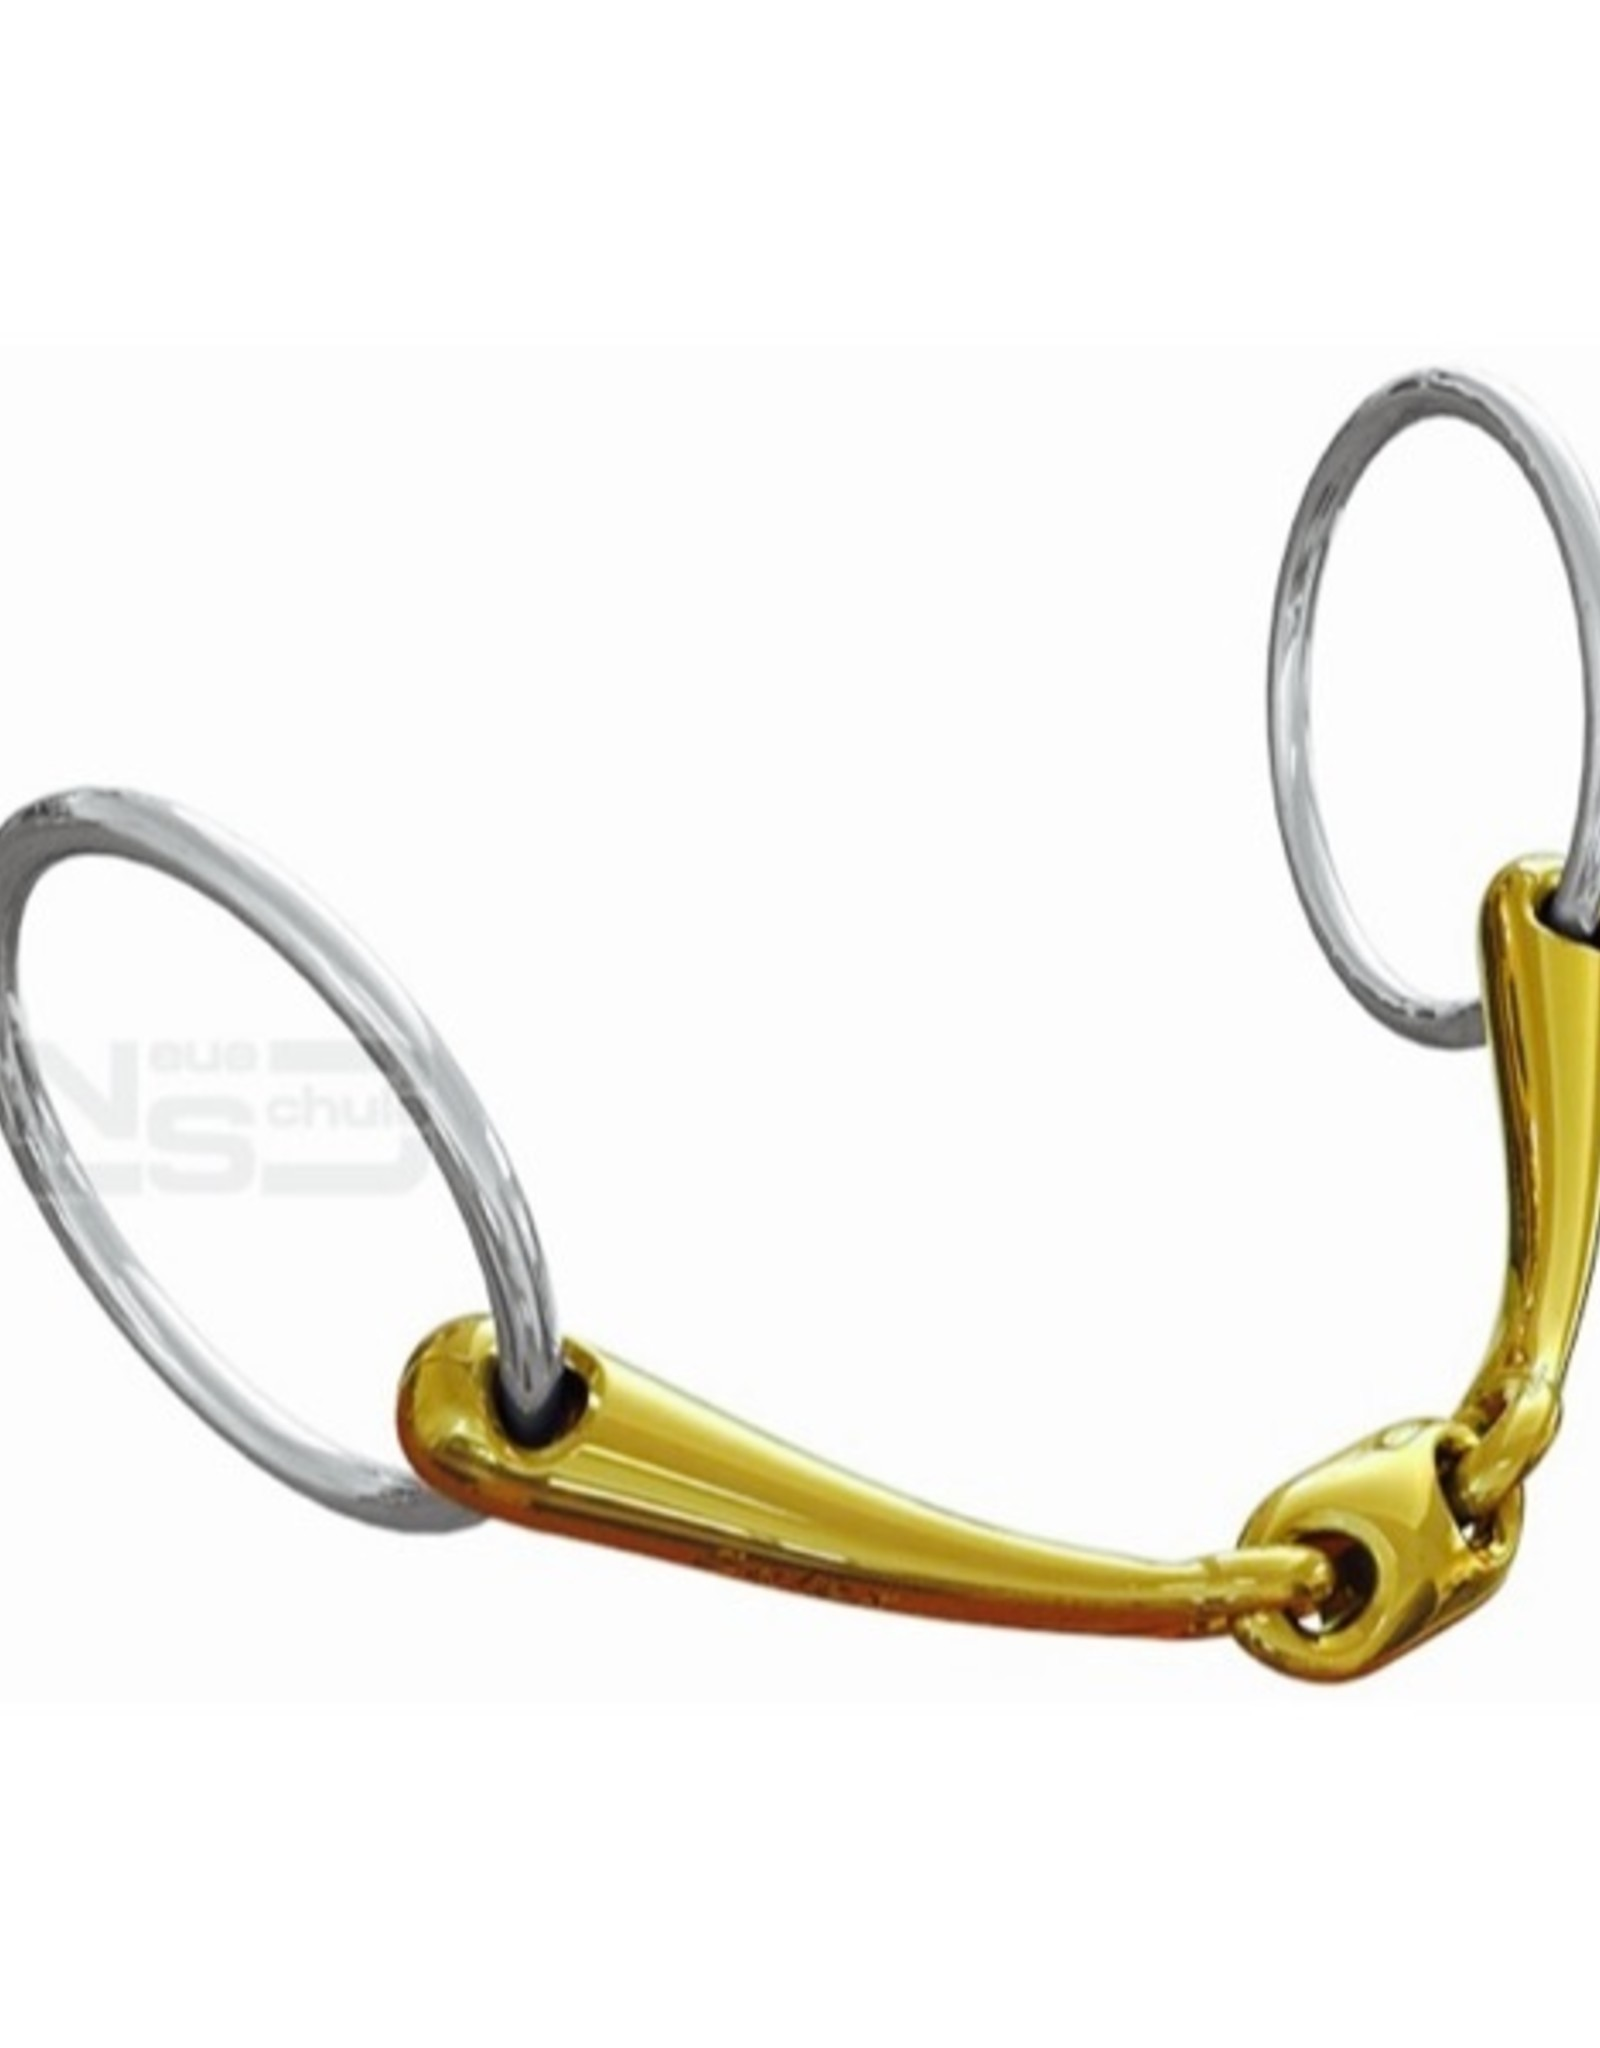 Neue Schule Neue Schule Tranz Angled Lozenge Loose Ring Bit